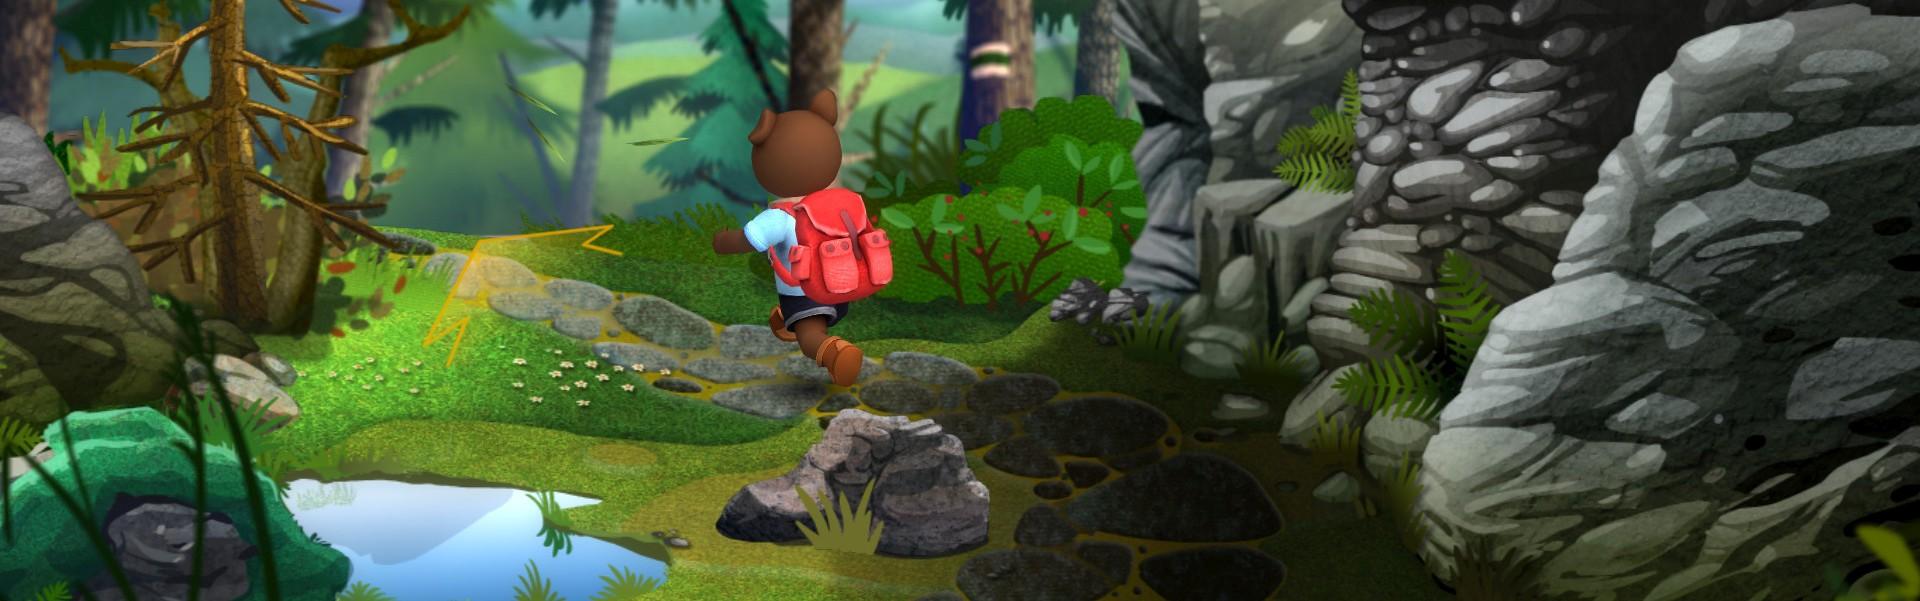 Teddy Floppy Ear - Mountain Adventure Steam Key GLOBAL